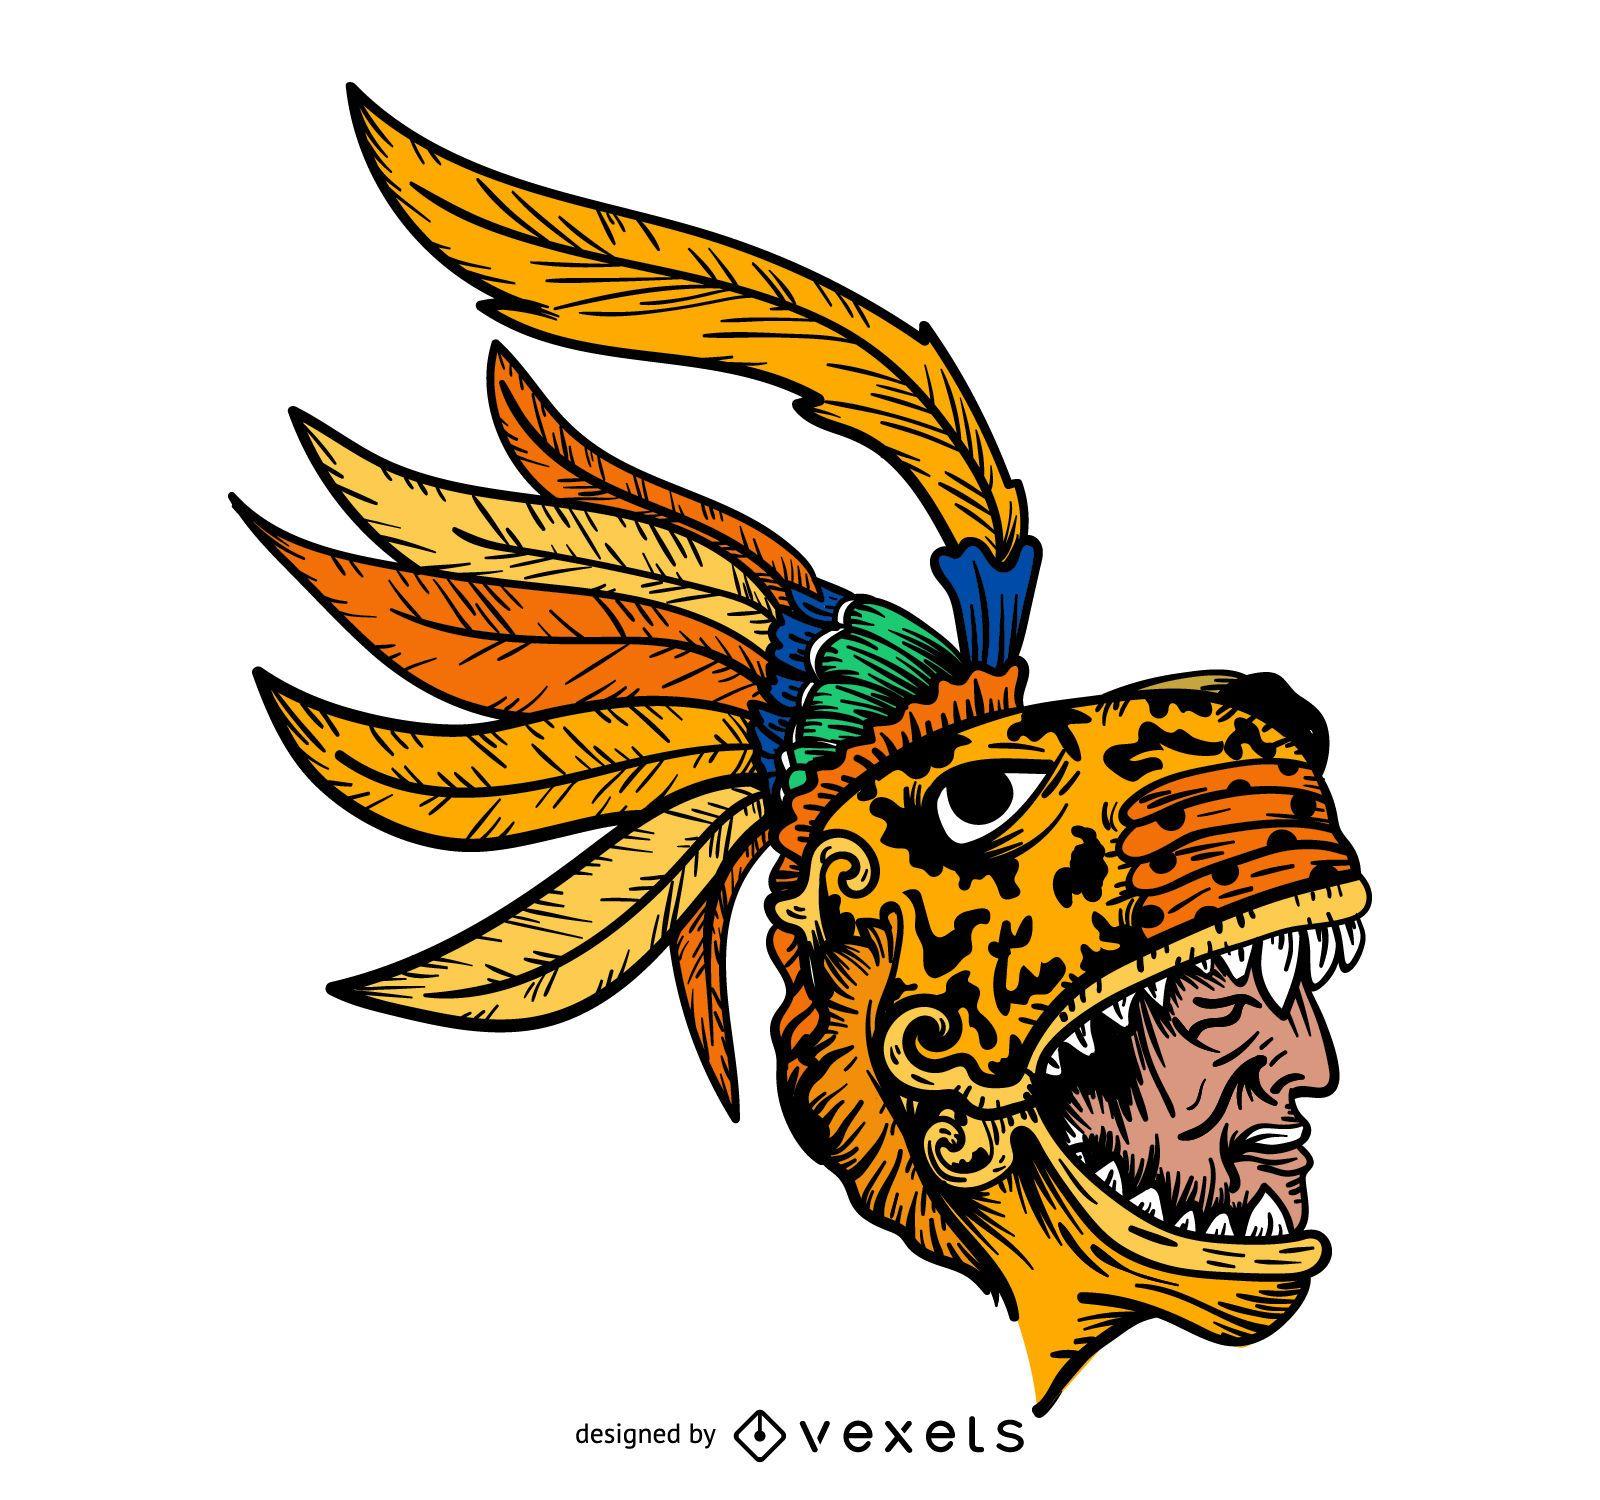 Aztec chieftain head illustration